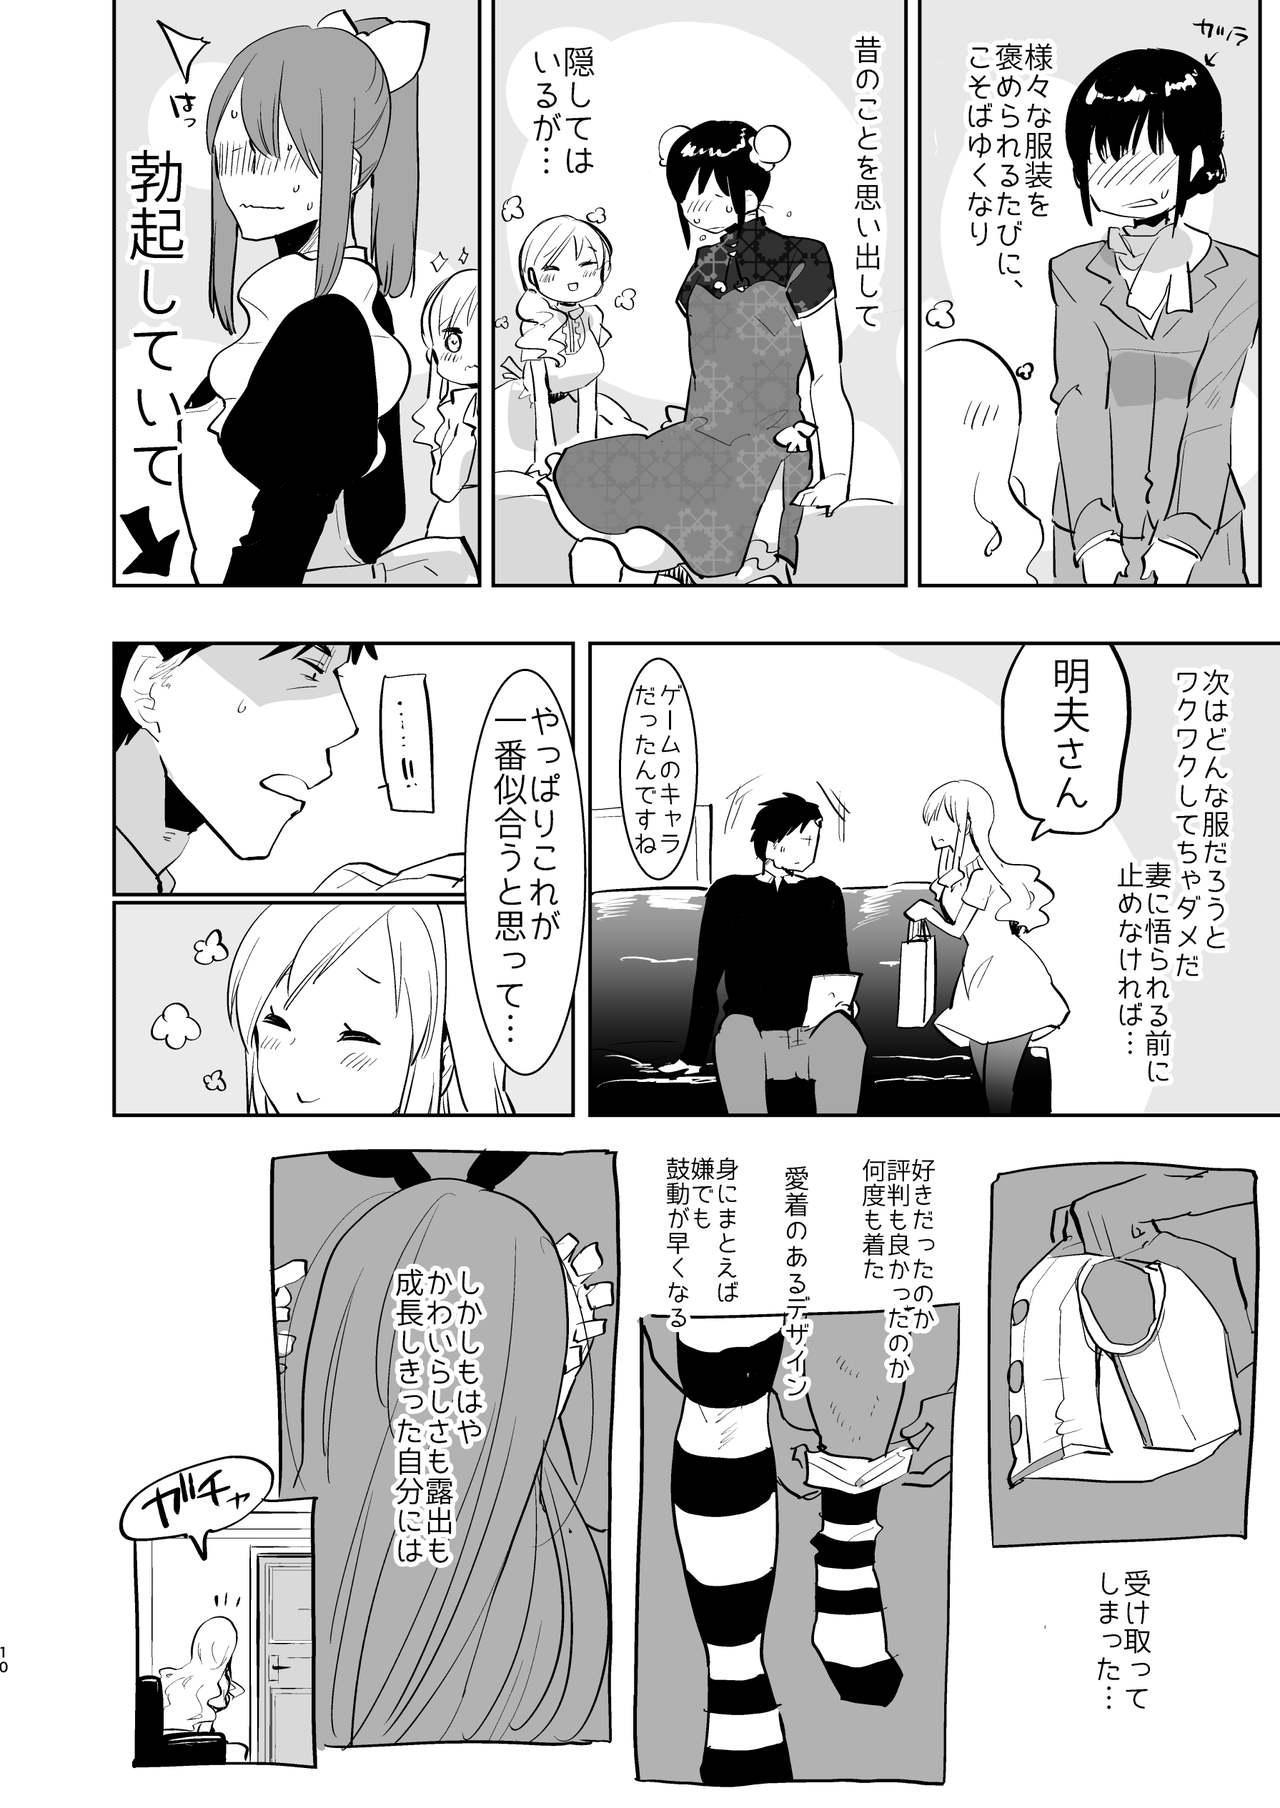 [Aimaitei (Aimaitei Umami)] Otto wa Shimakaze-kun 30-sai [Digital] 9